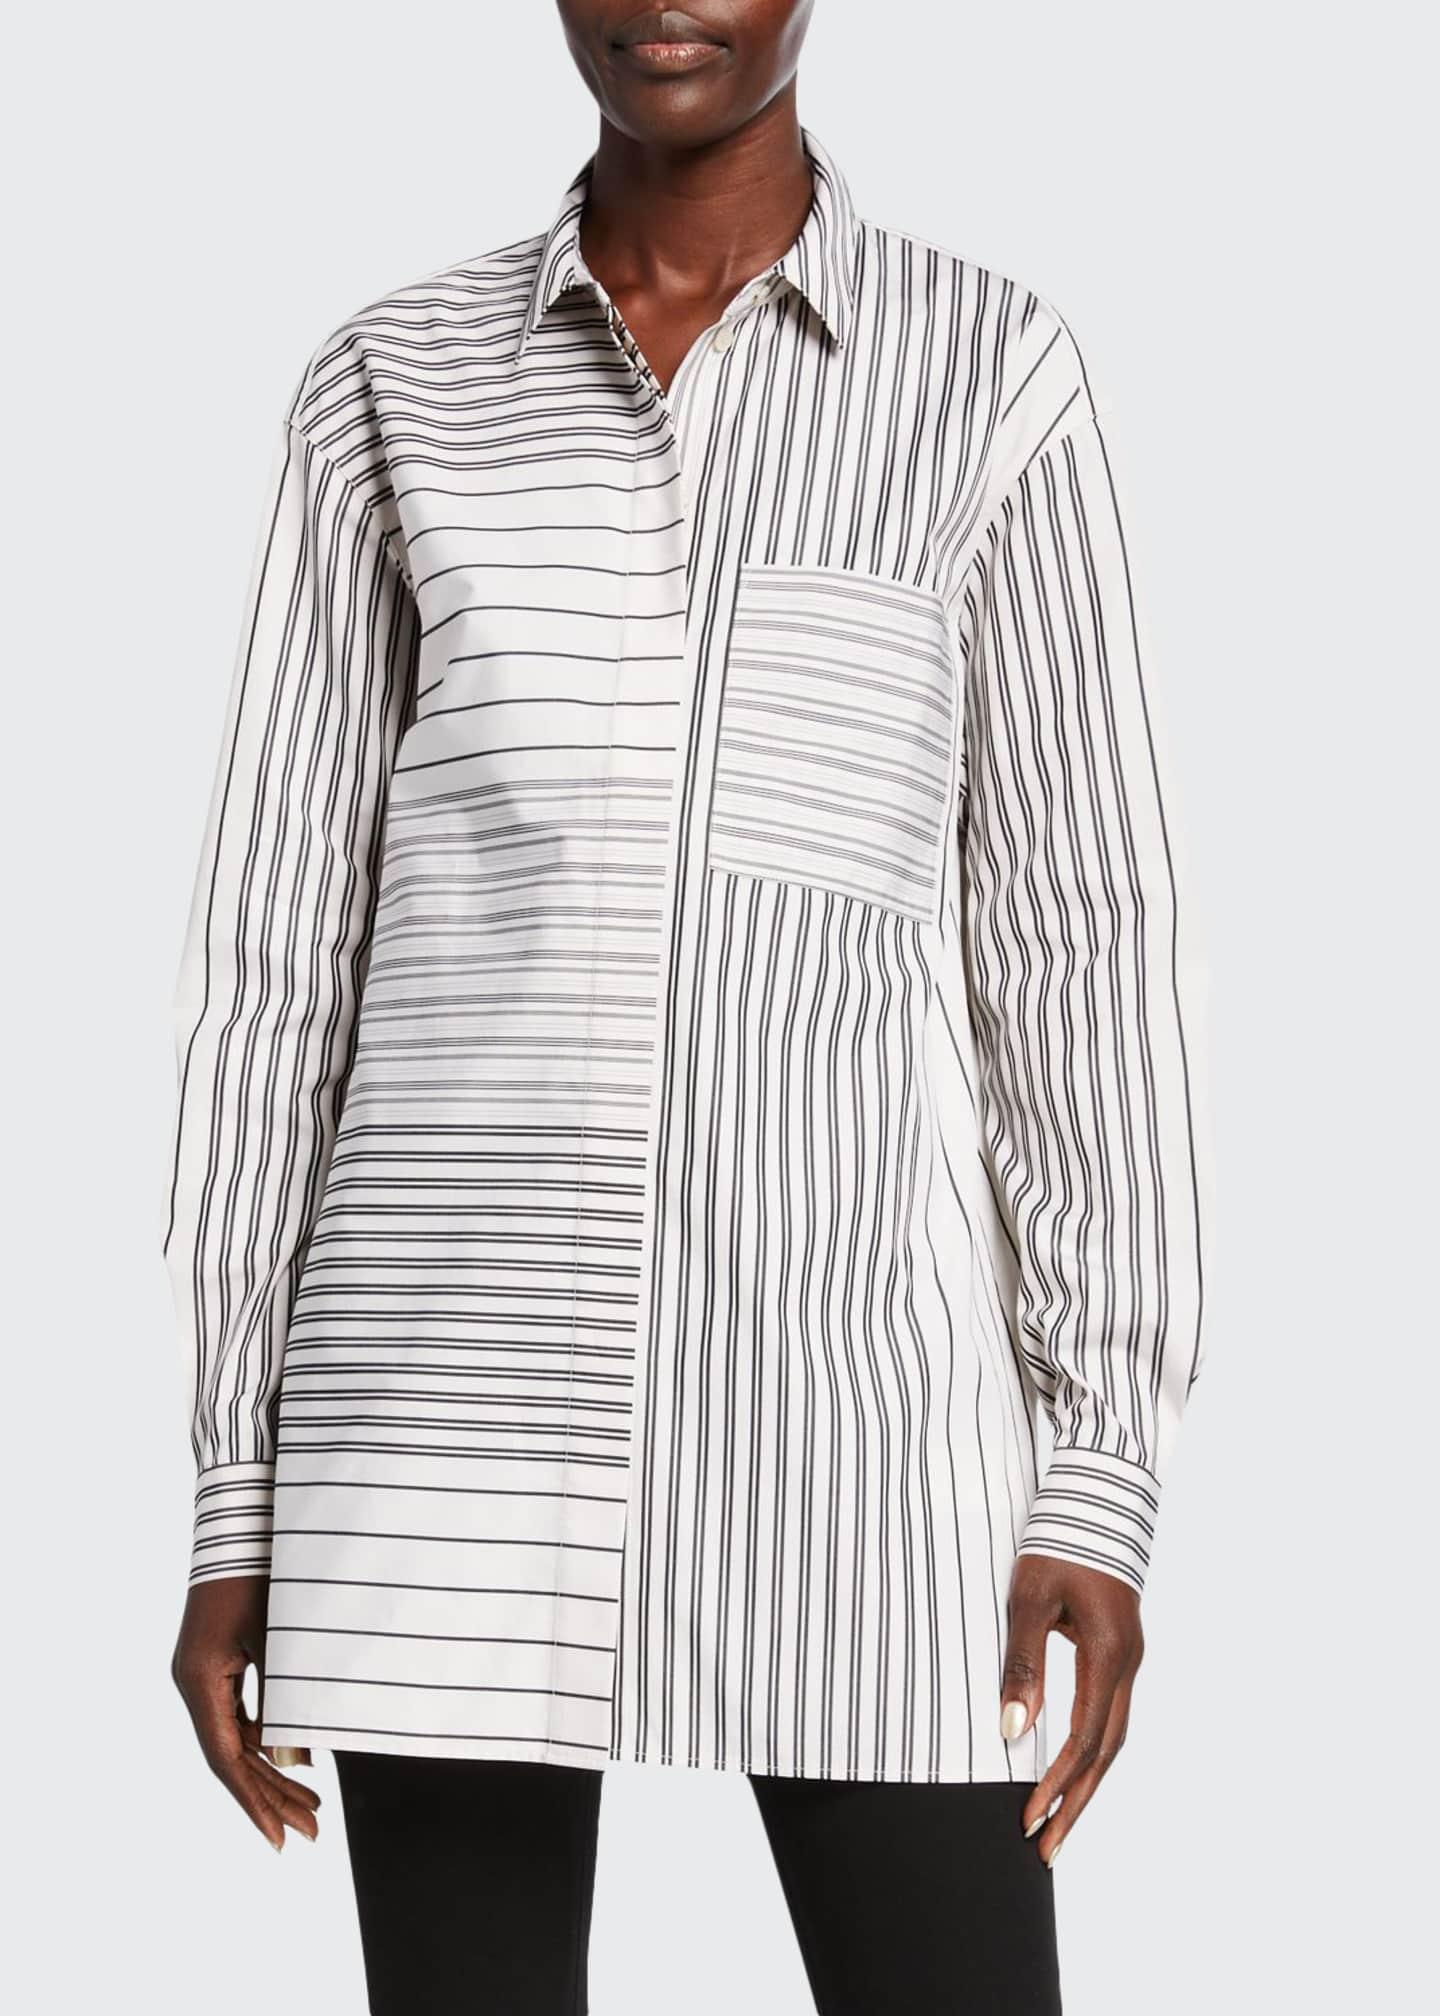 Lafayette 148 New York Maston Transcendent Stripe Cotton